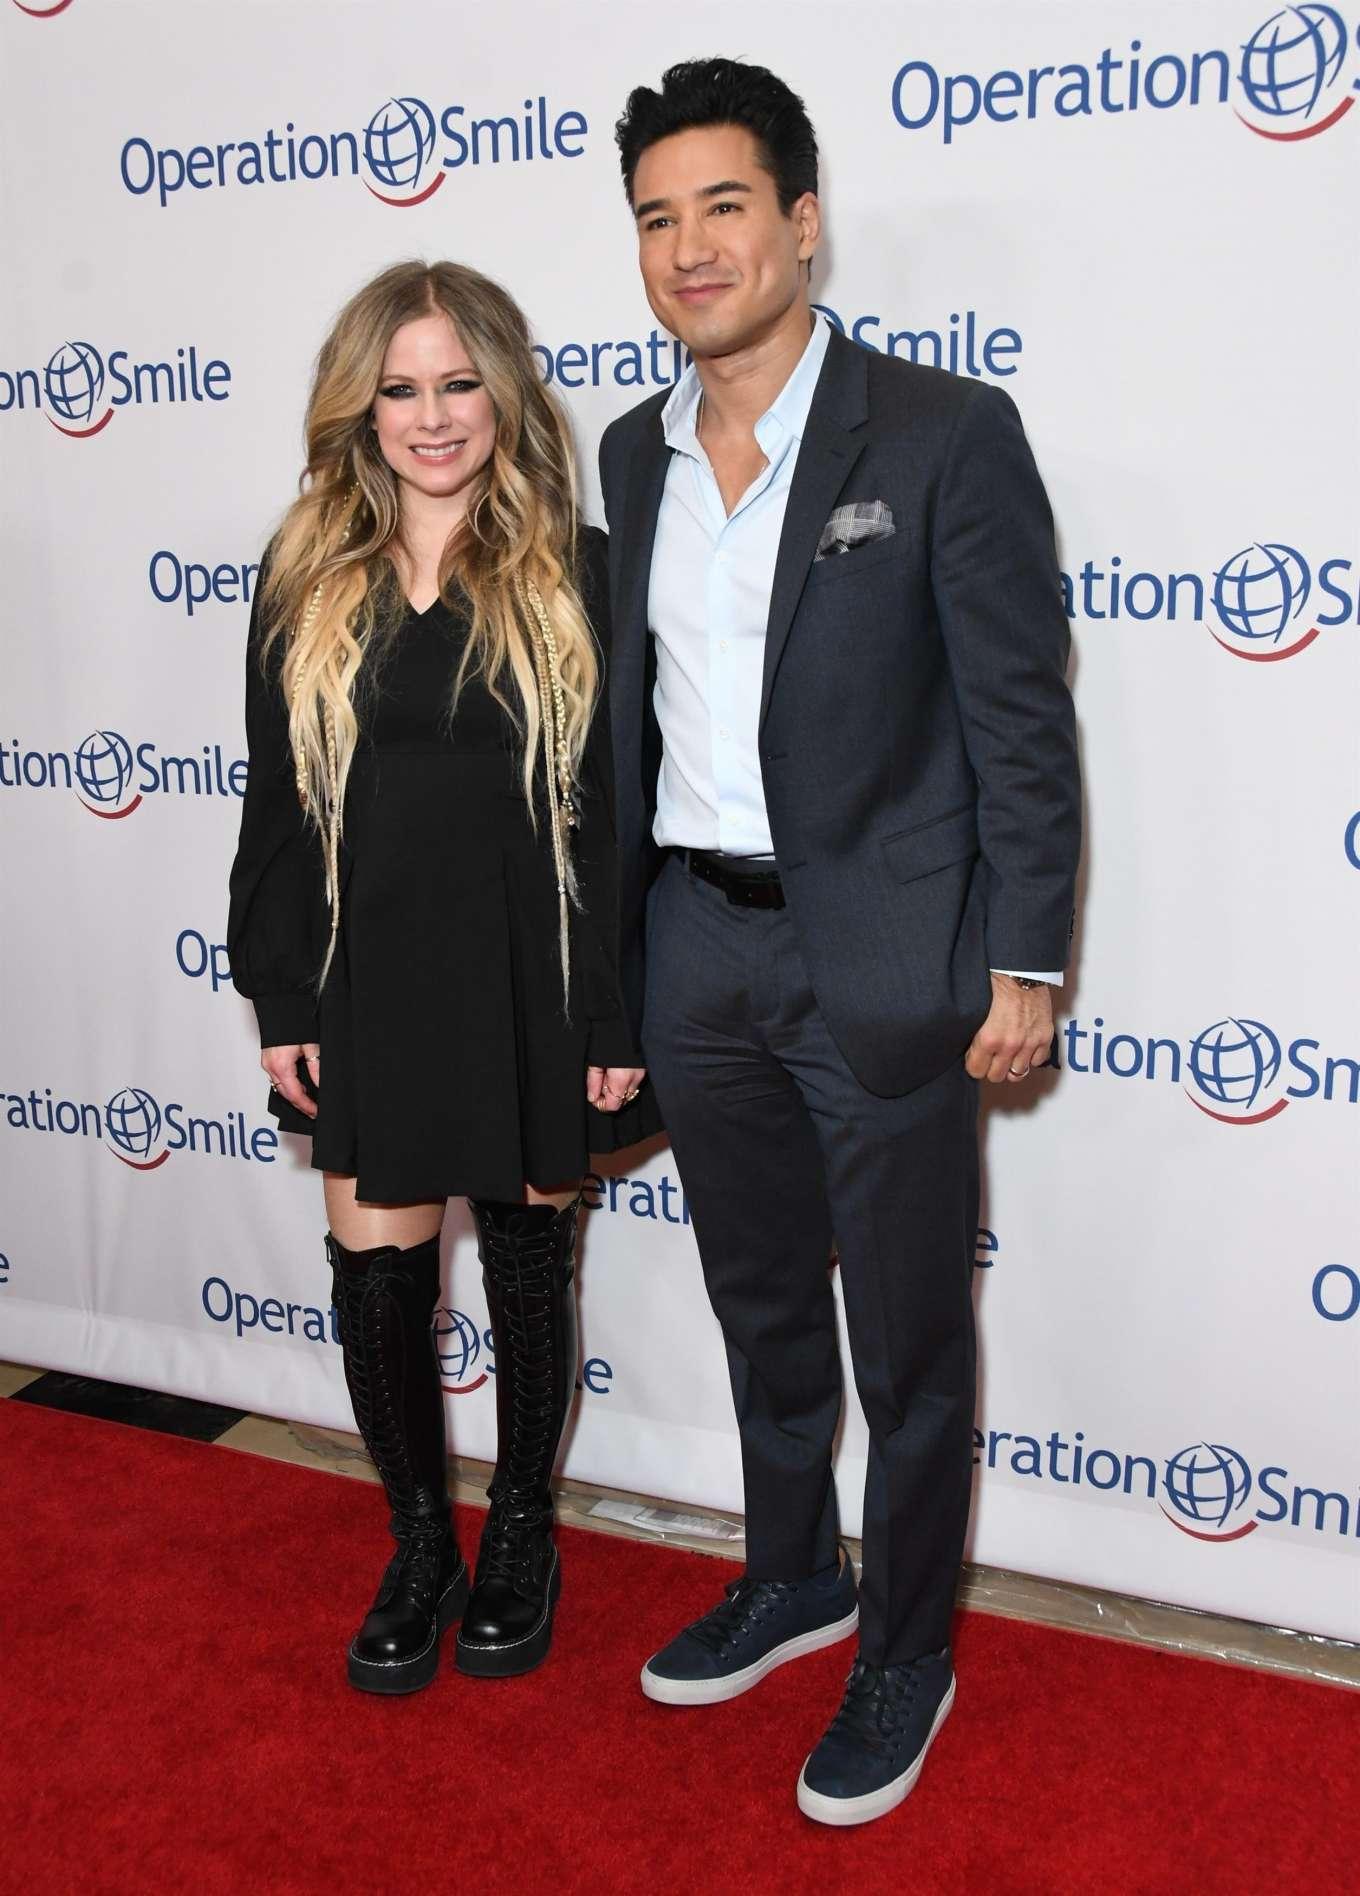 Avril Lavigne 2019 : Avril Lavigne – Operation Smile Hollywood Fight Night-15